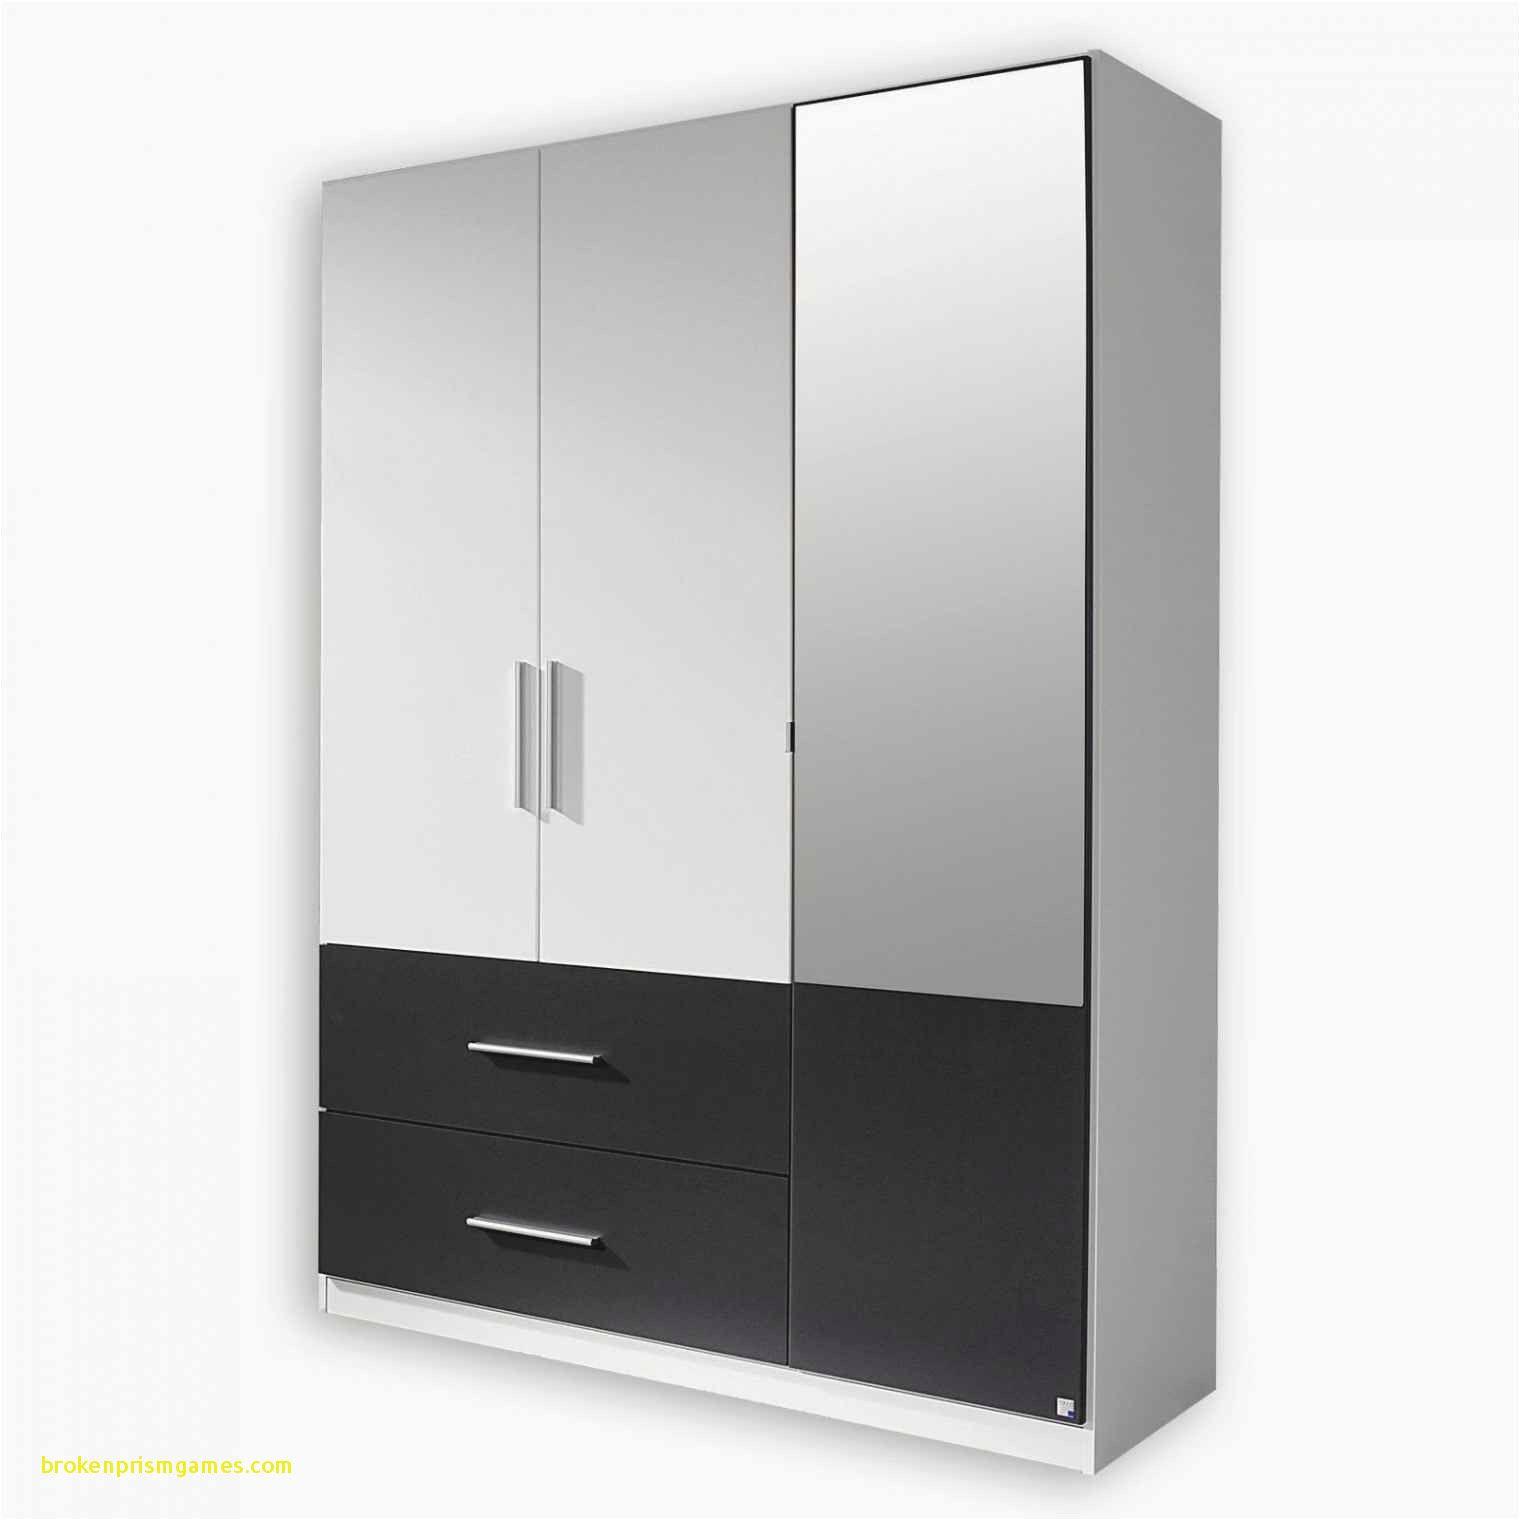 Kleiderschrank 40 Cm Tief Ikea